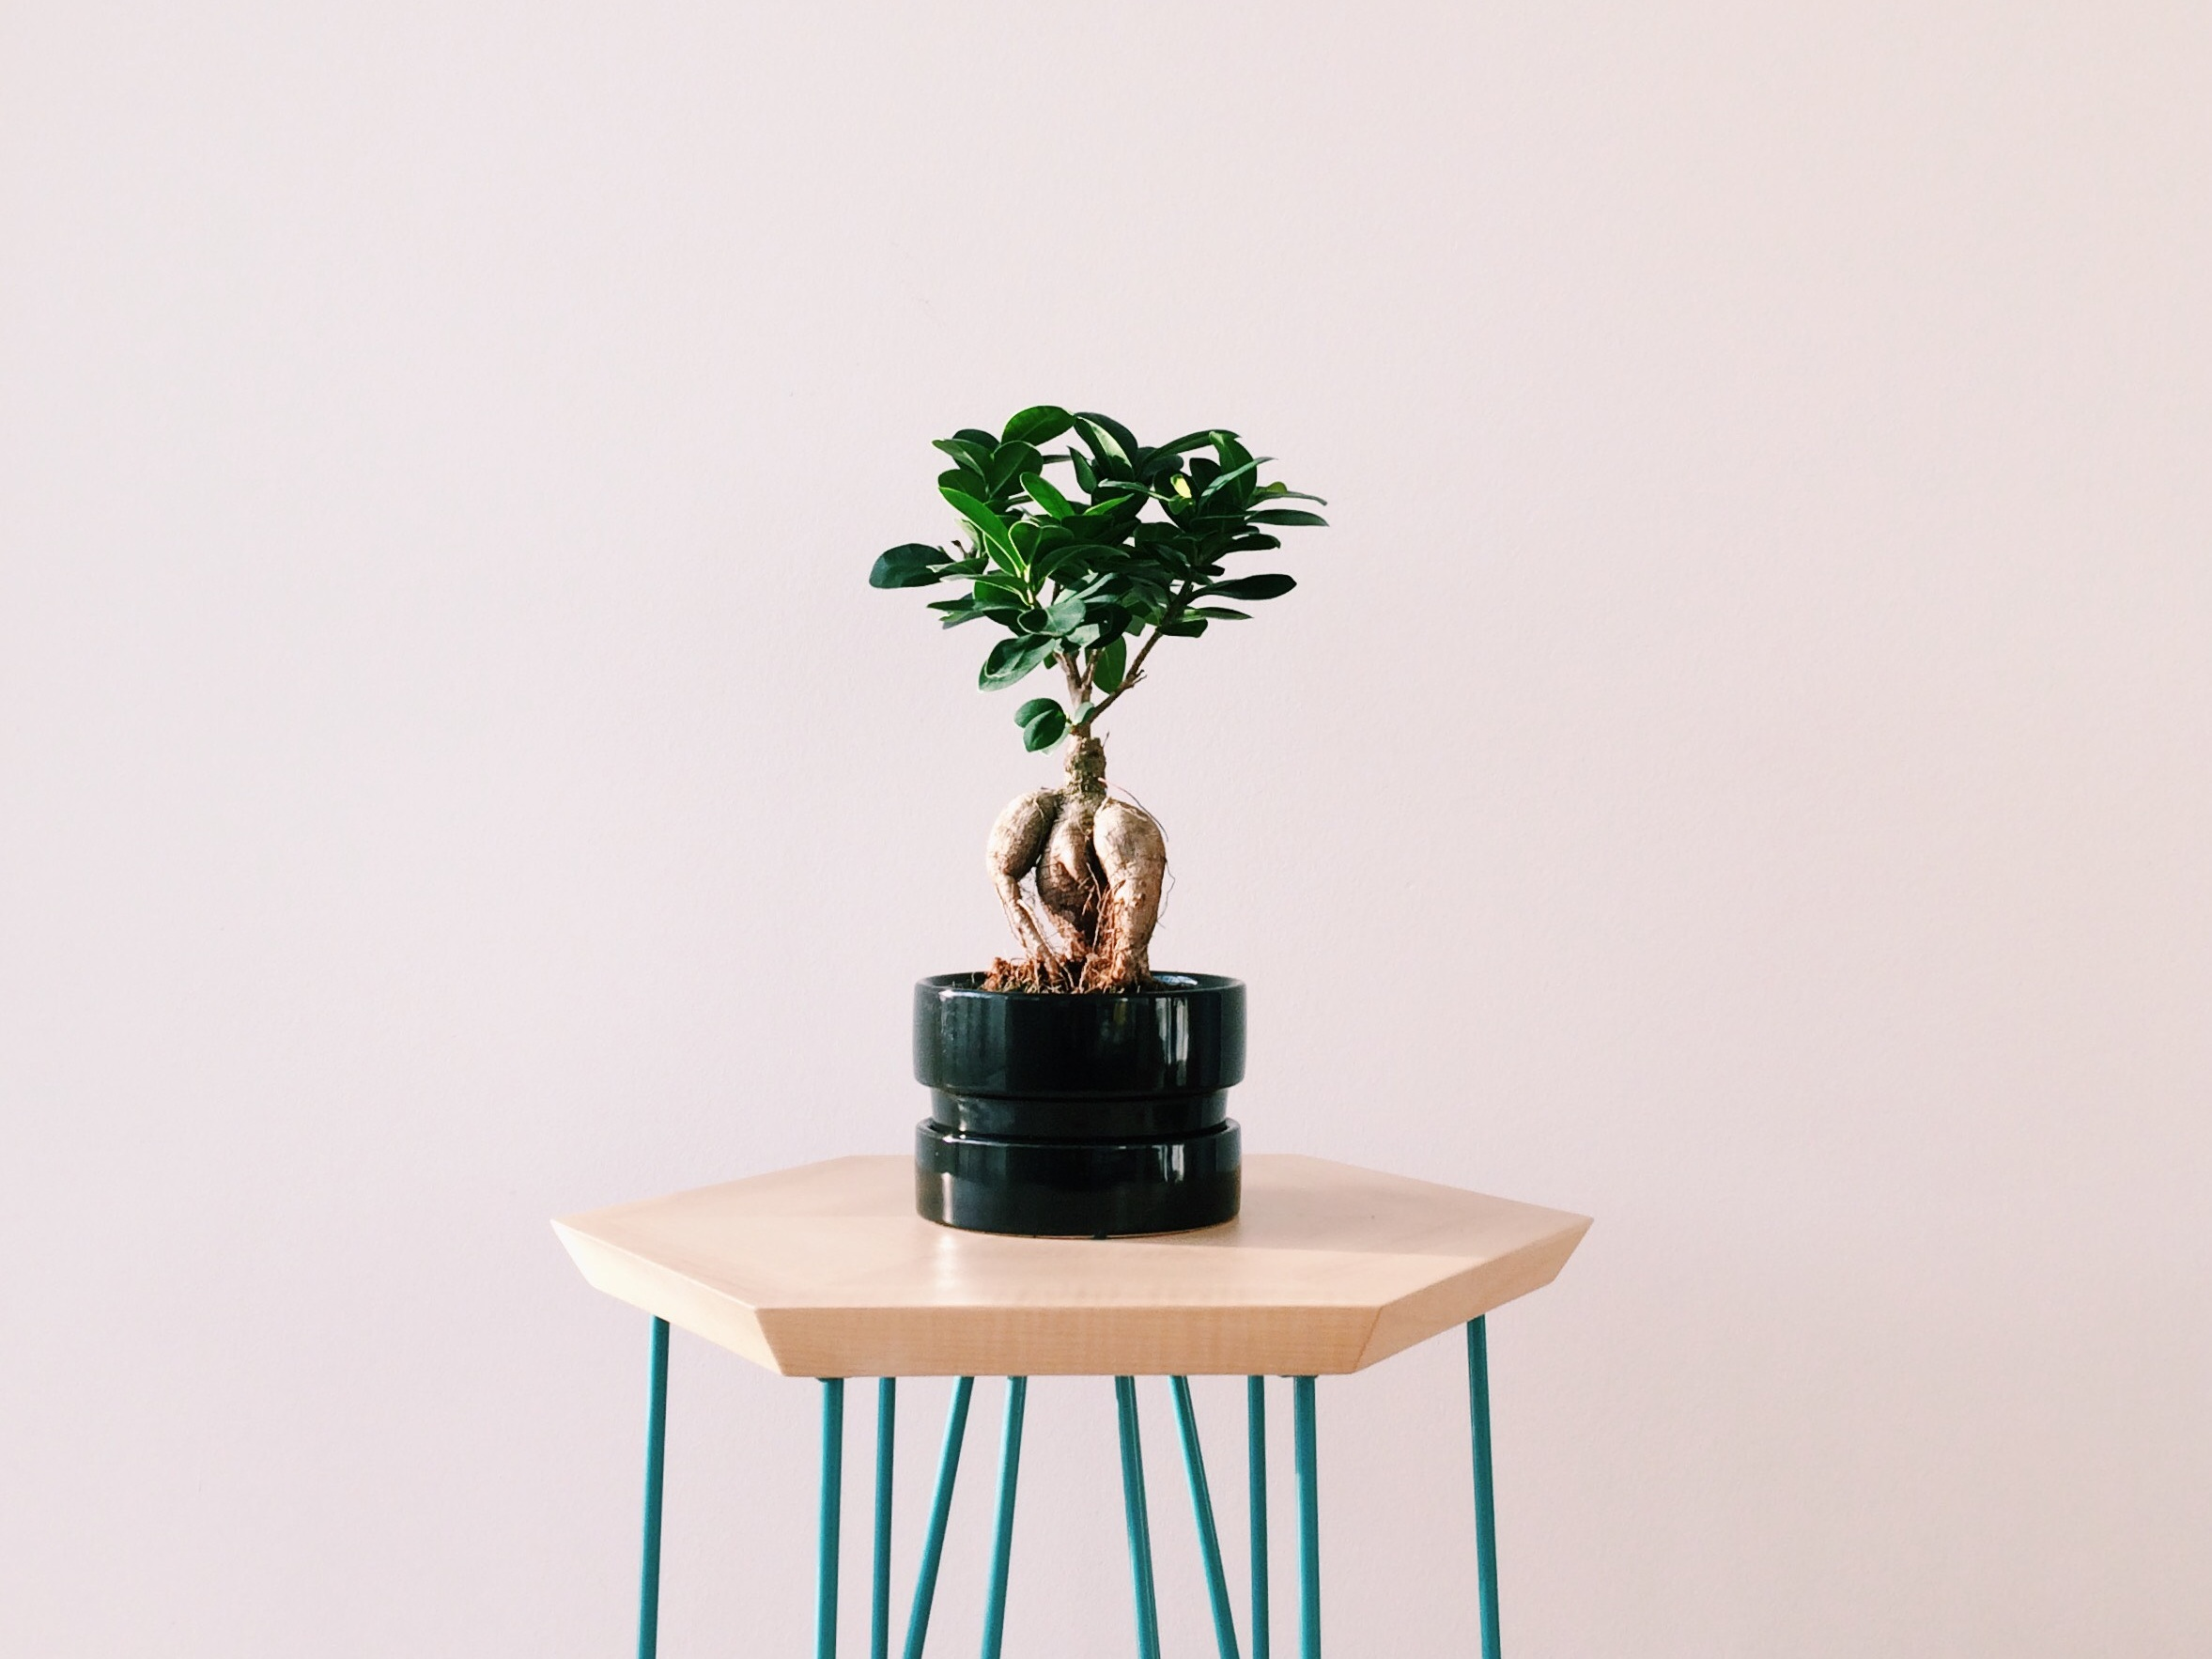 ESENEL - bespoke furniture